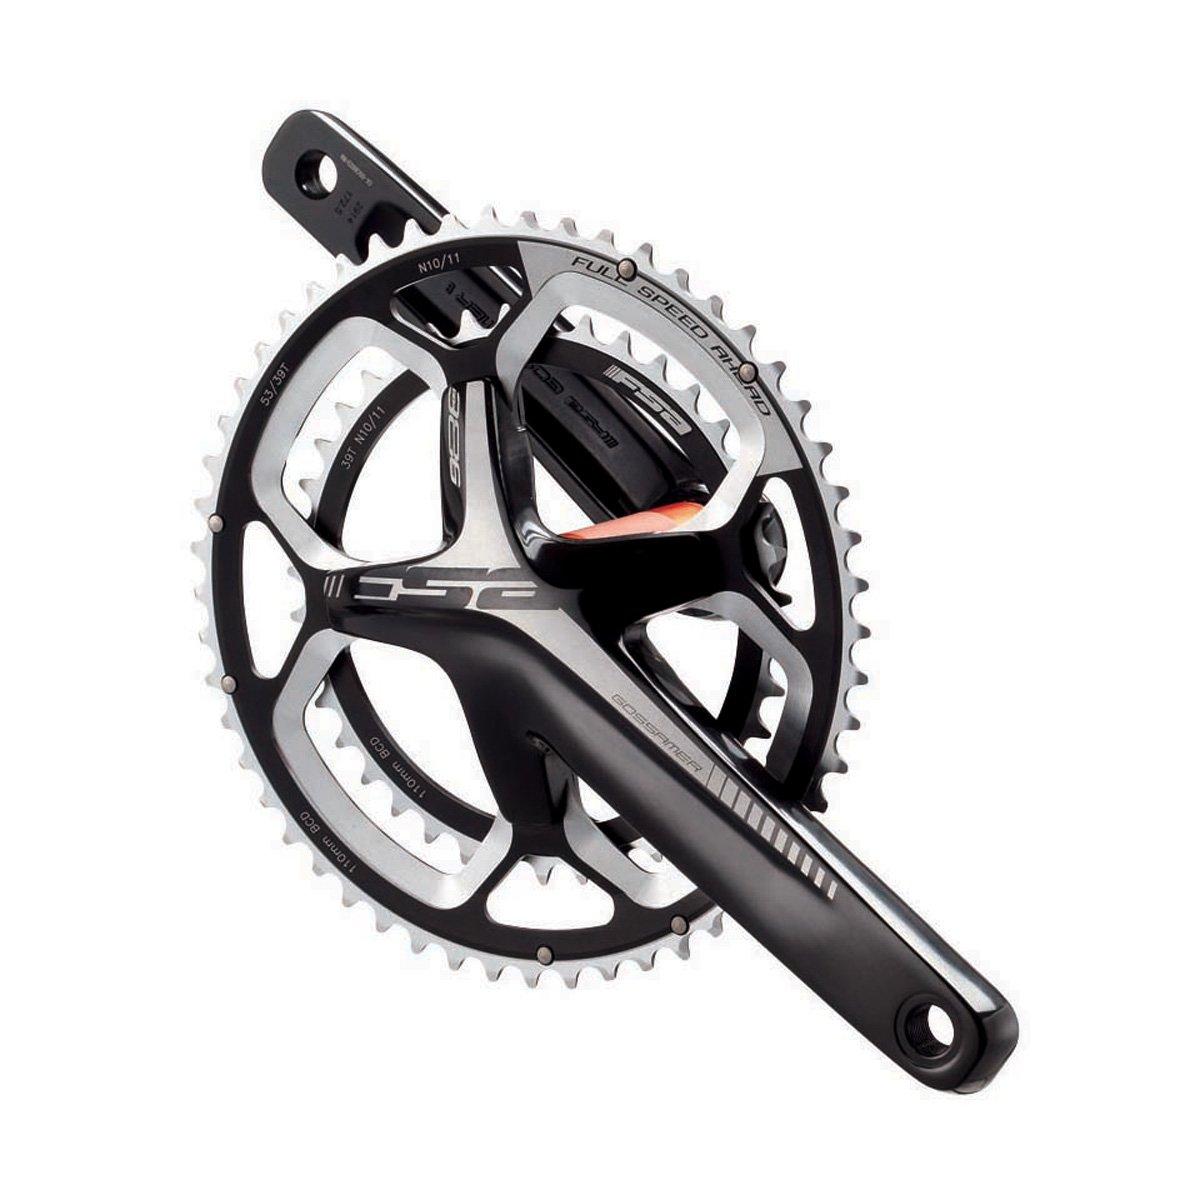 Gossamer 386EVO Bicycle Crankset Black